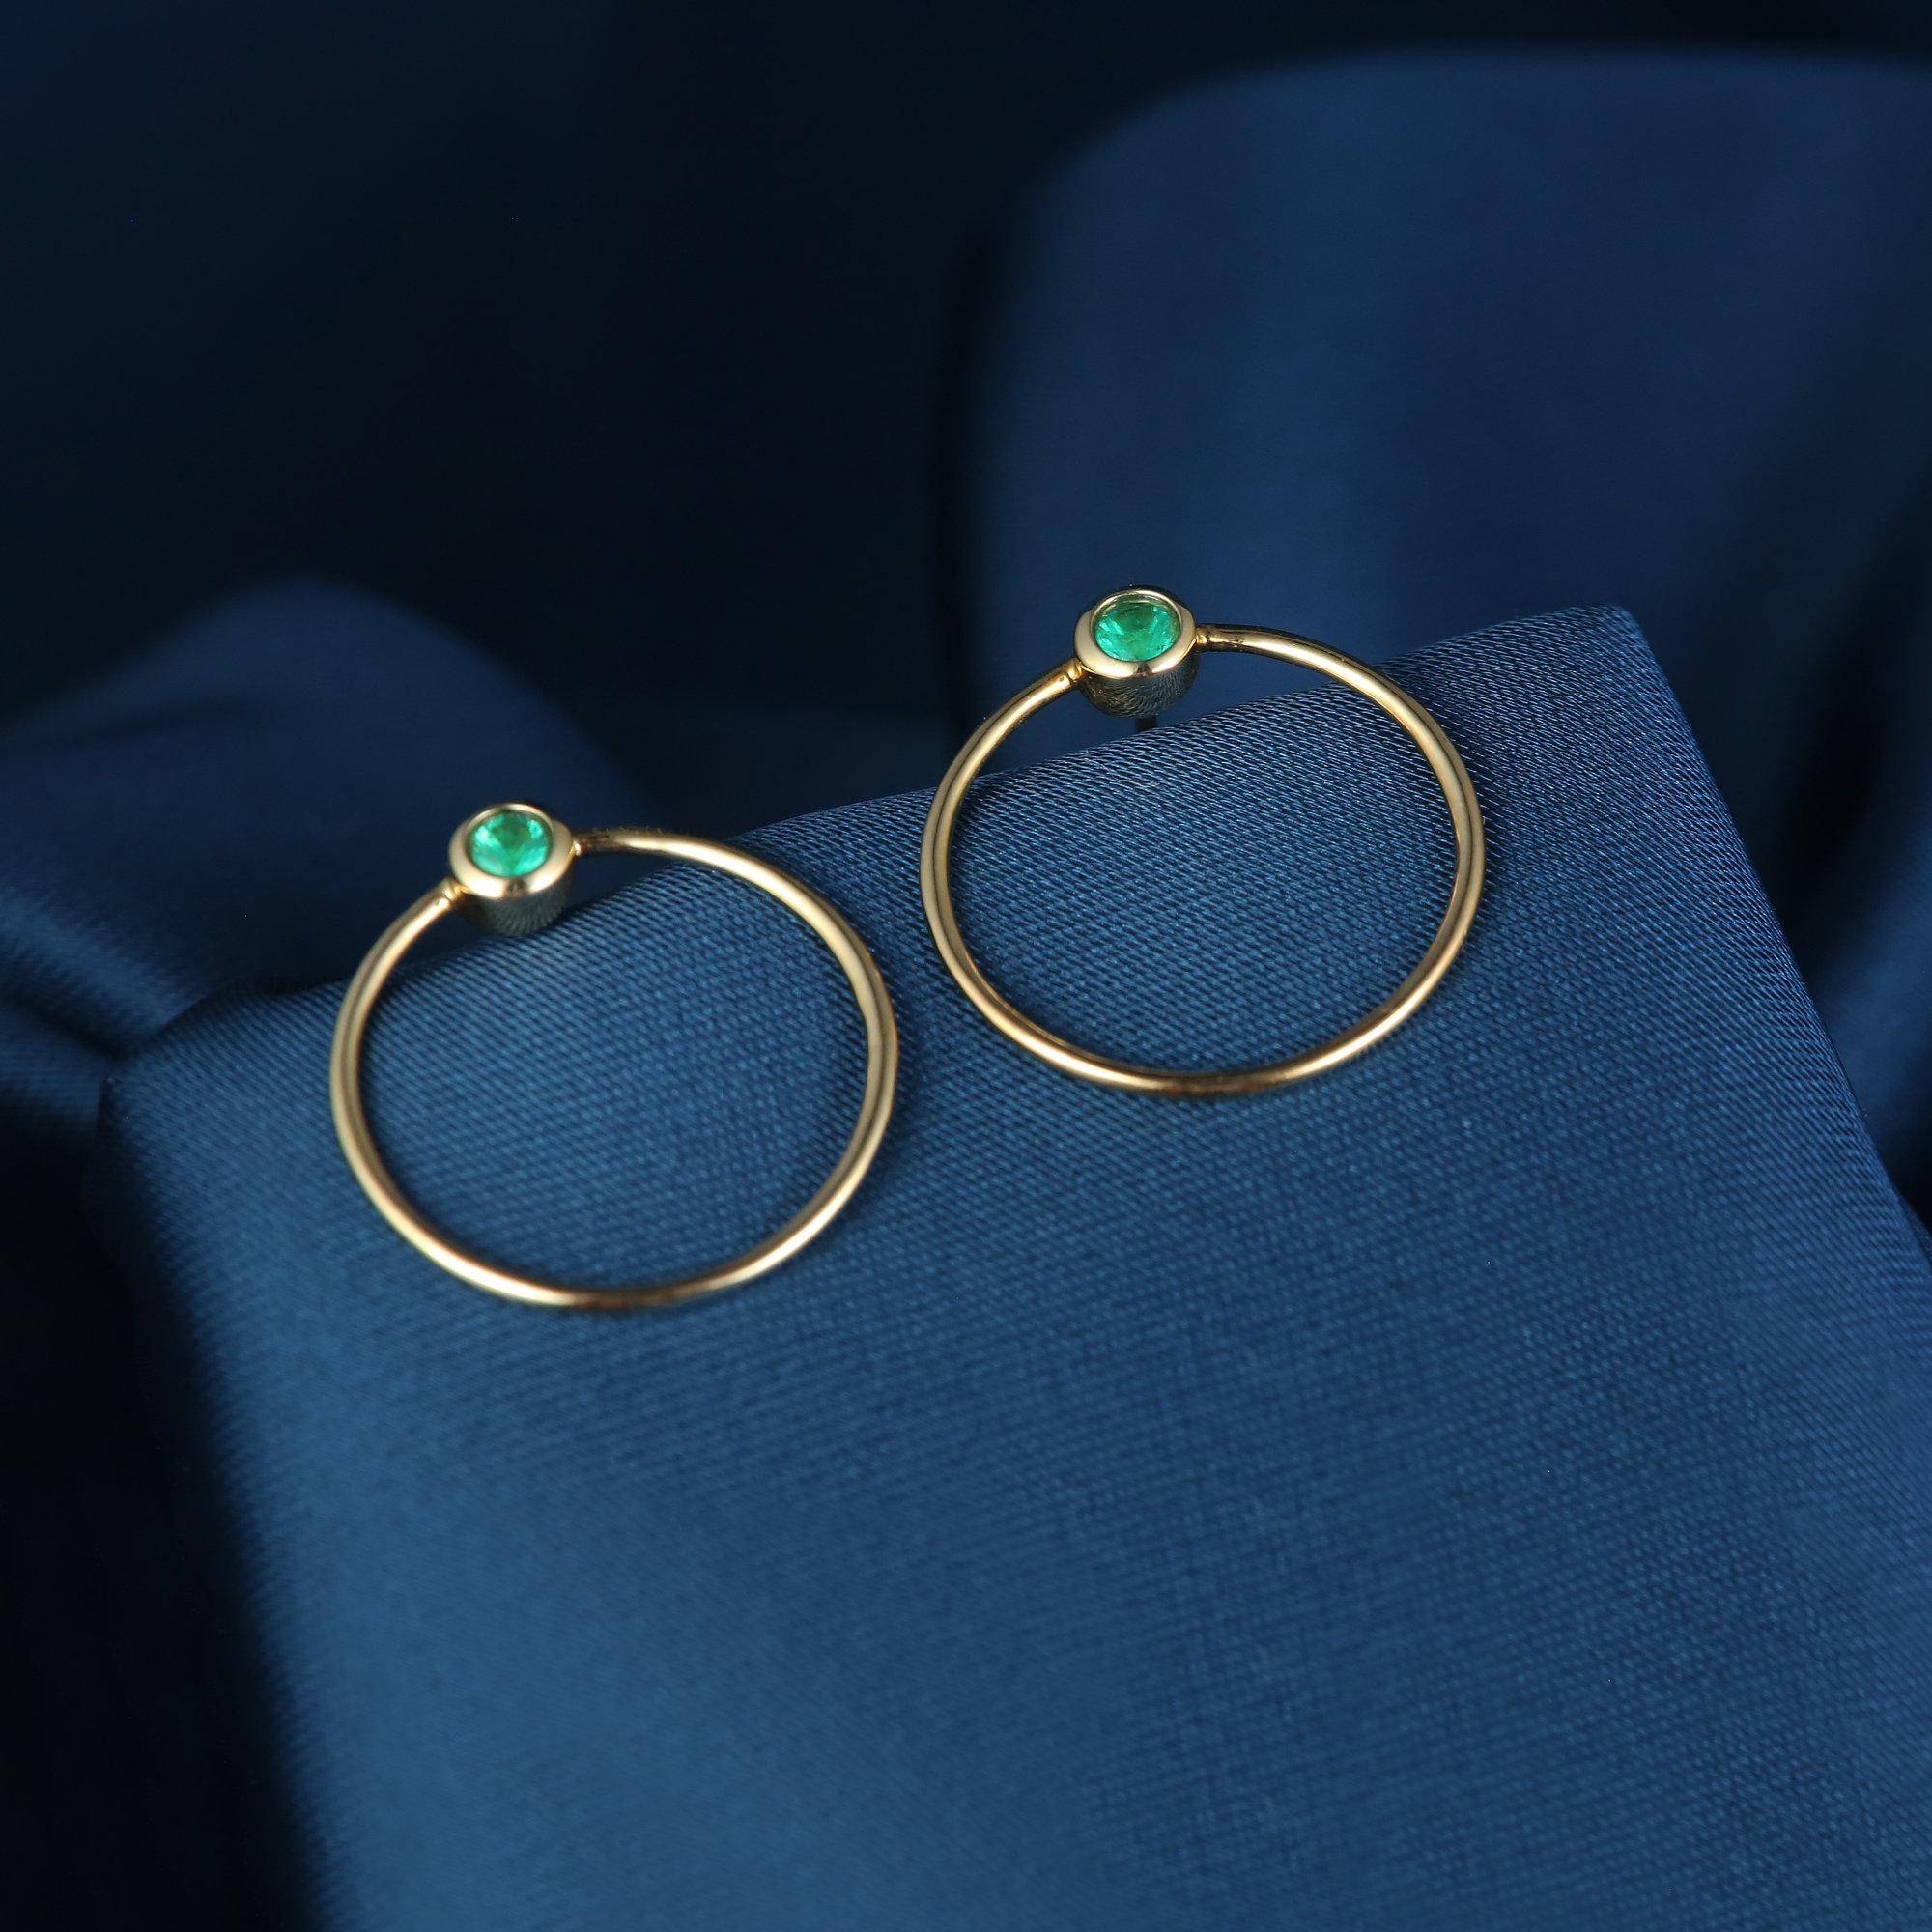 DCJewelry18K天然祖母绿耳钉项链套装欧美简约几何设计个性时尚OL